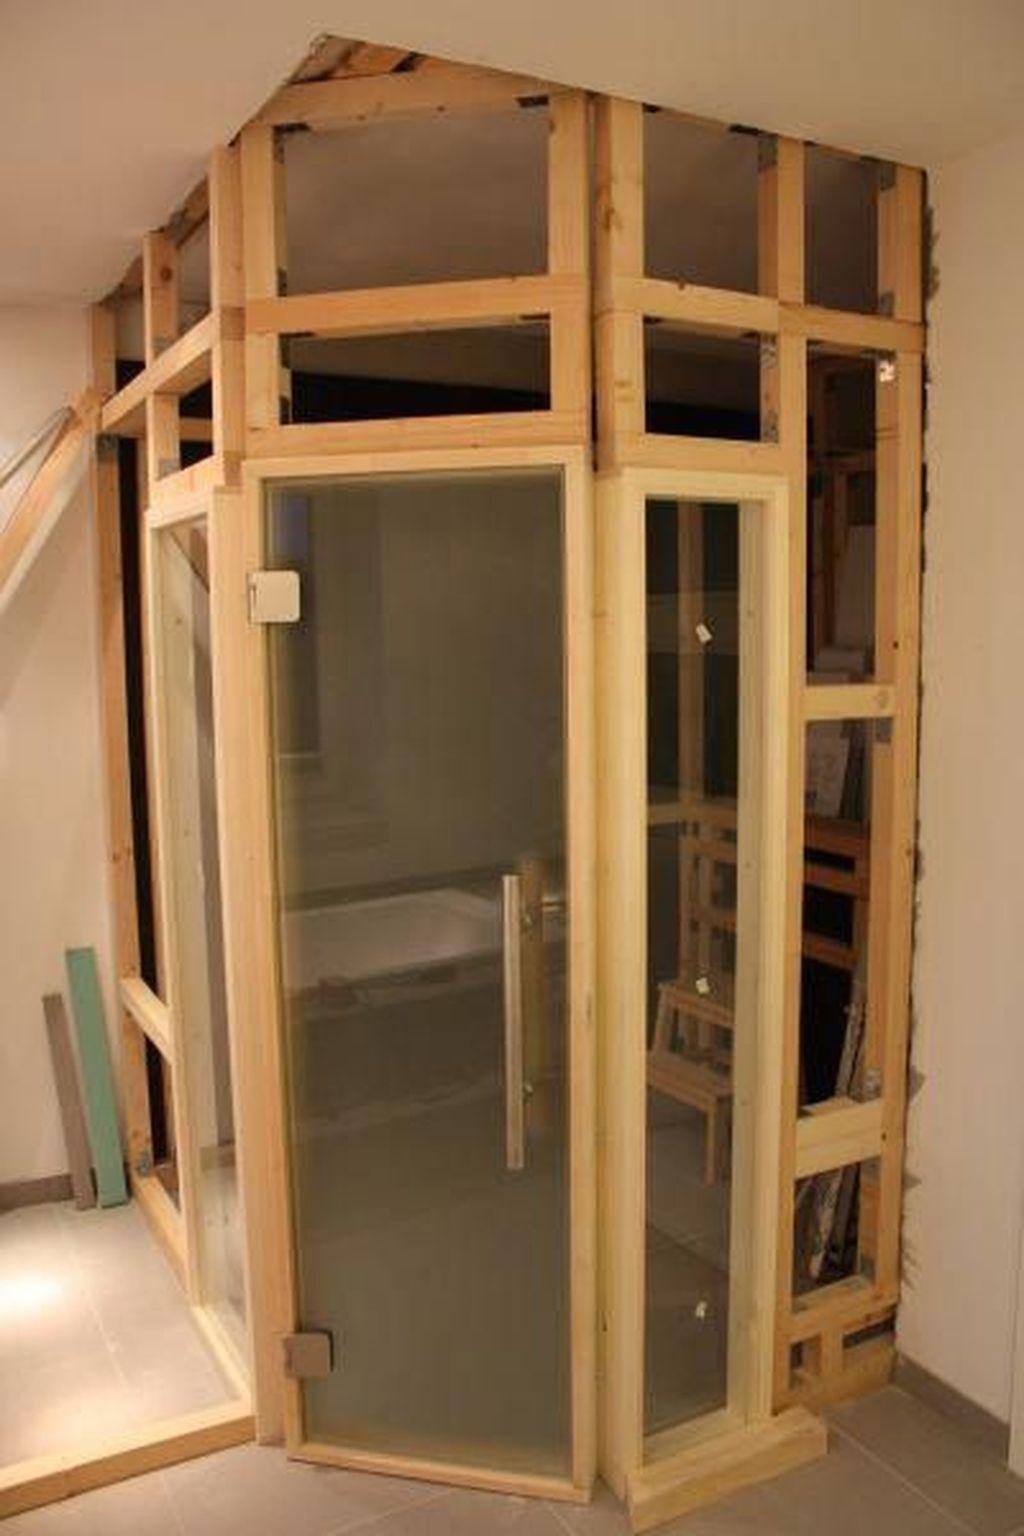 diy sauna plans free